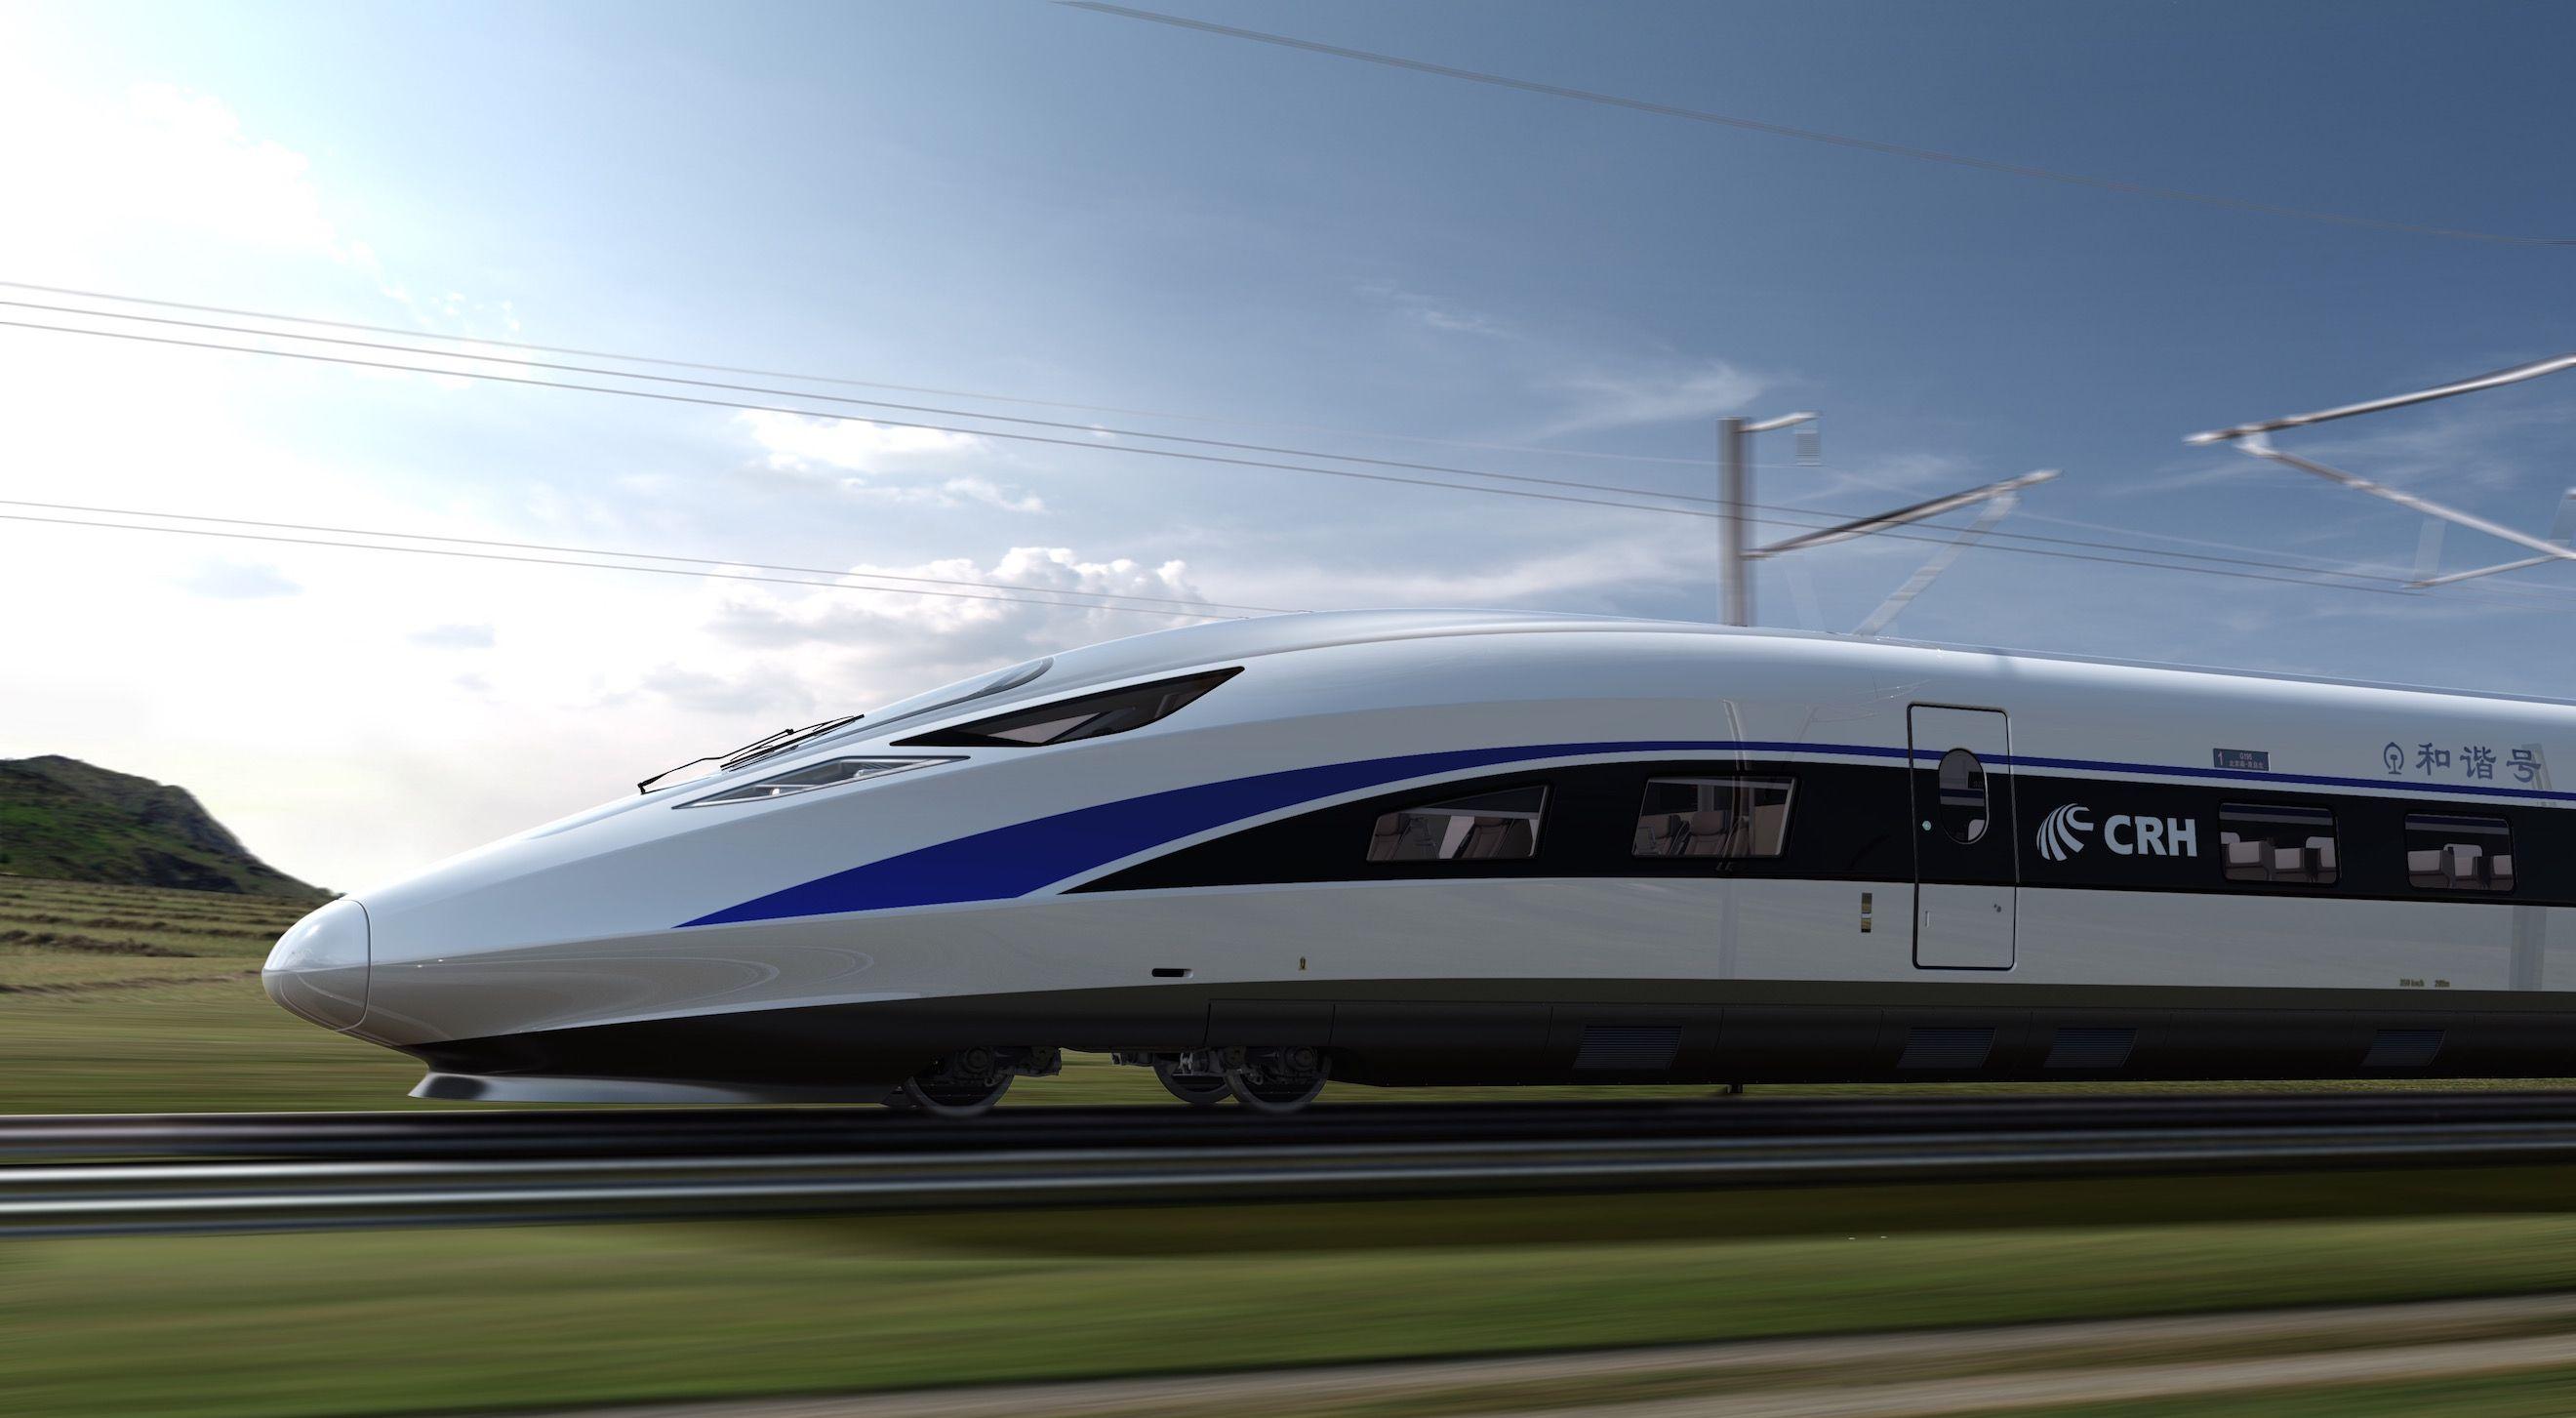 china railway engineering corporation stock - HD1920×1080